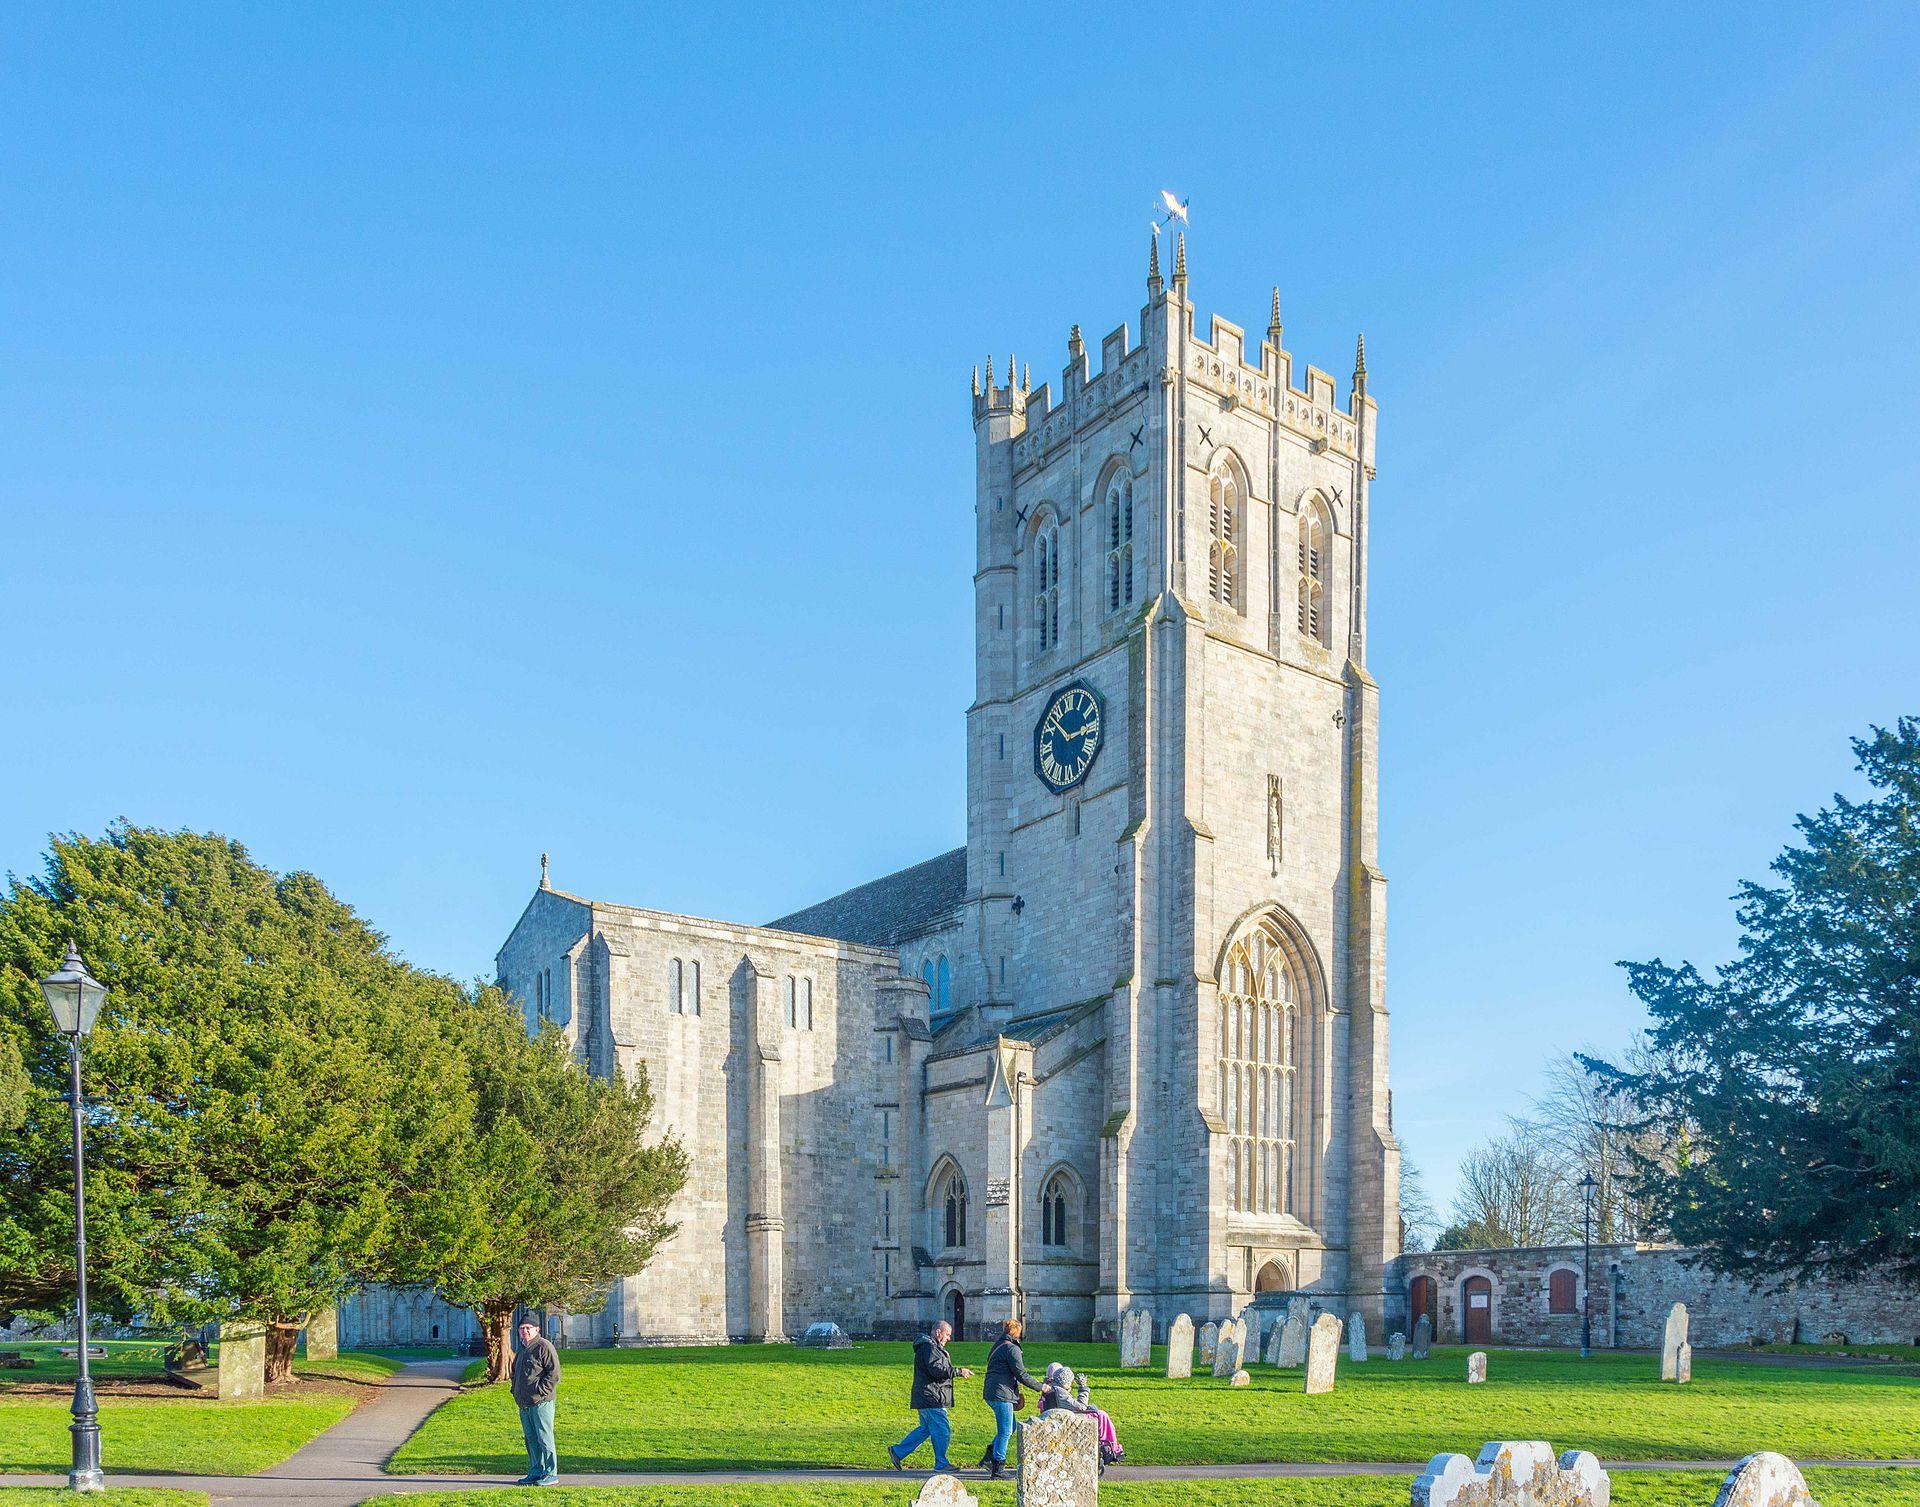 Christ Church Picture: Christchurch, Dorset